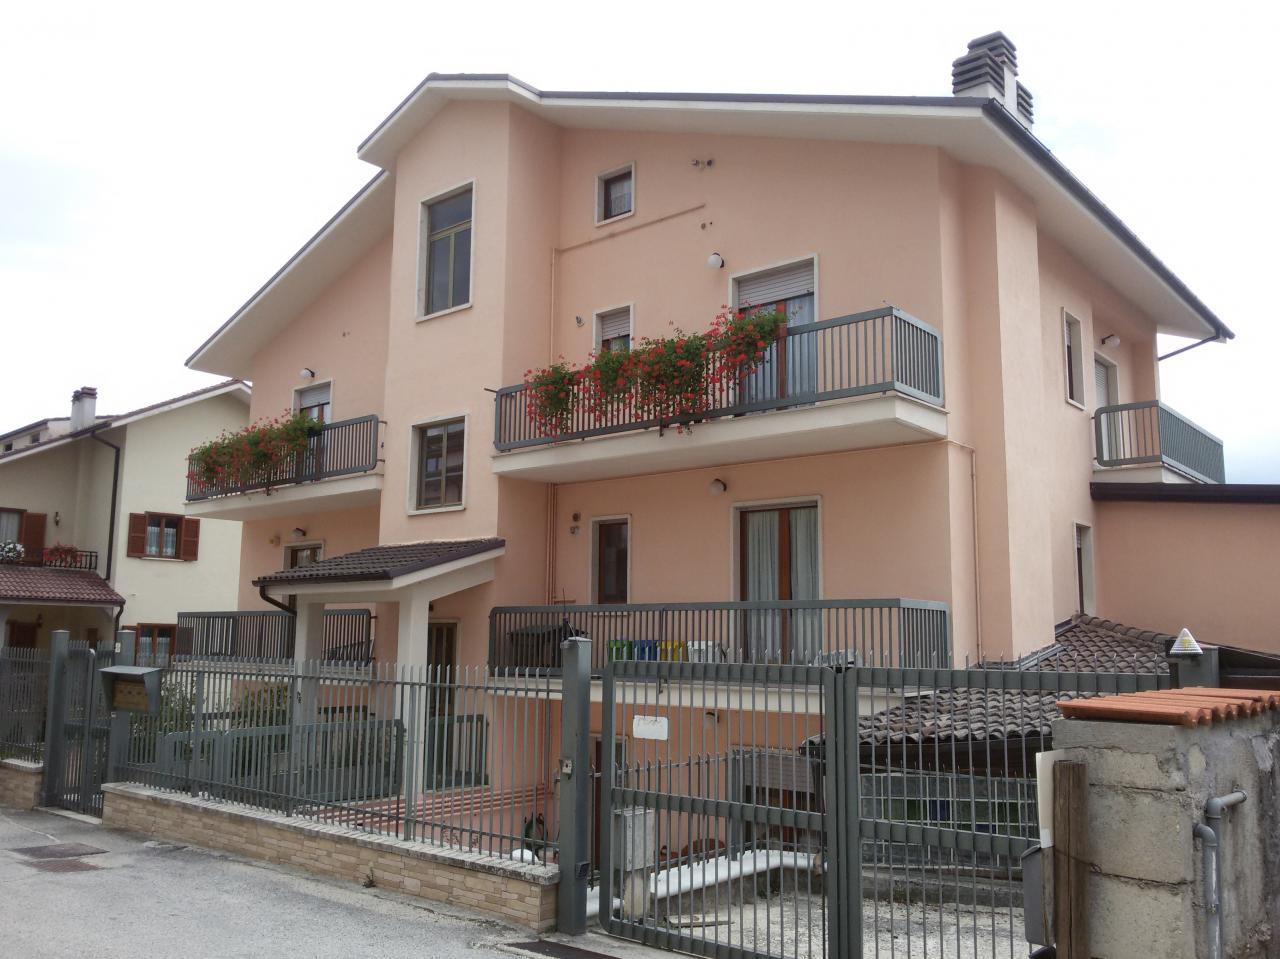 Trilocale in affitto a L'Aquila in Via Raffaele Cappelli